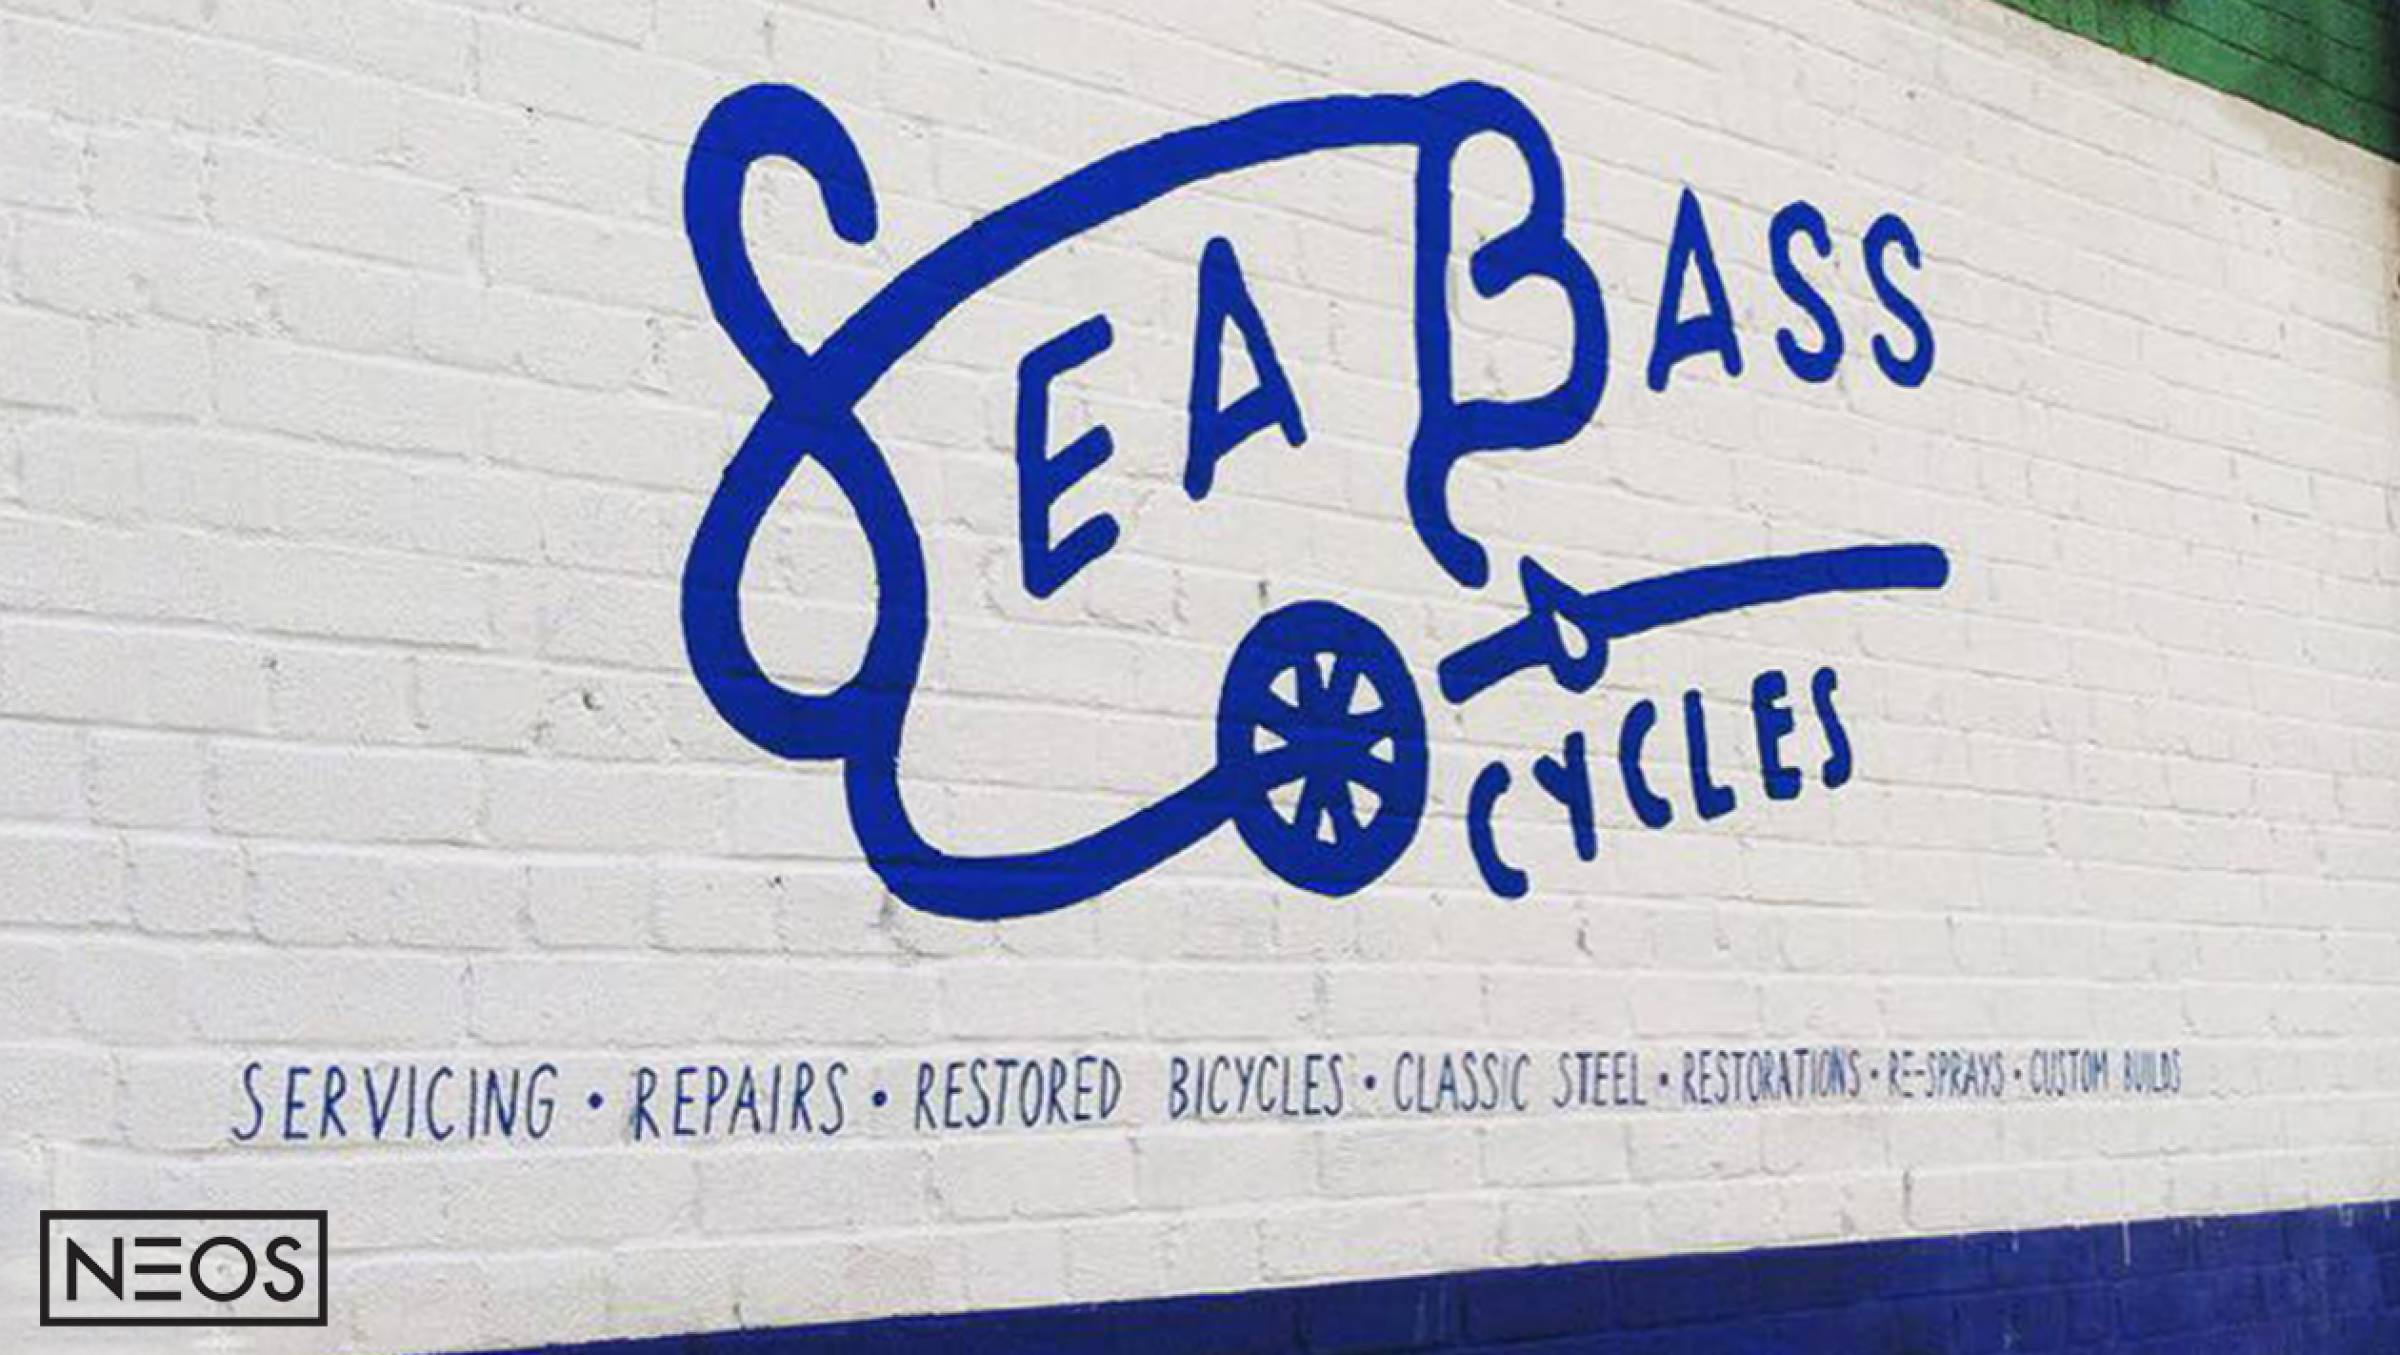 SeaBass Cycles Peckham